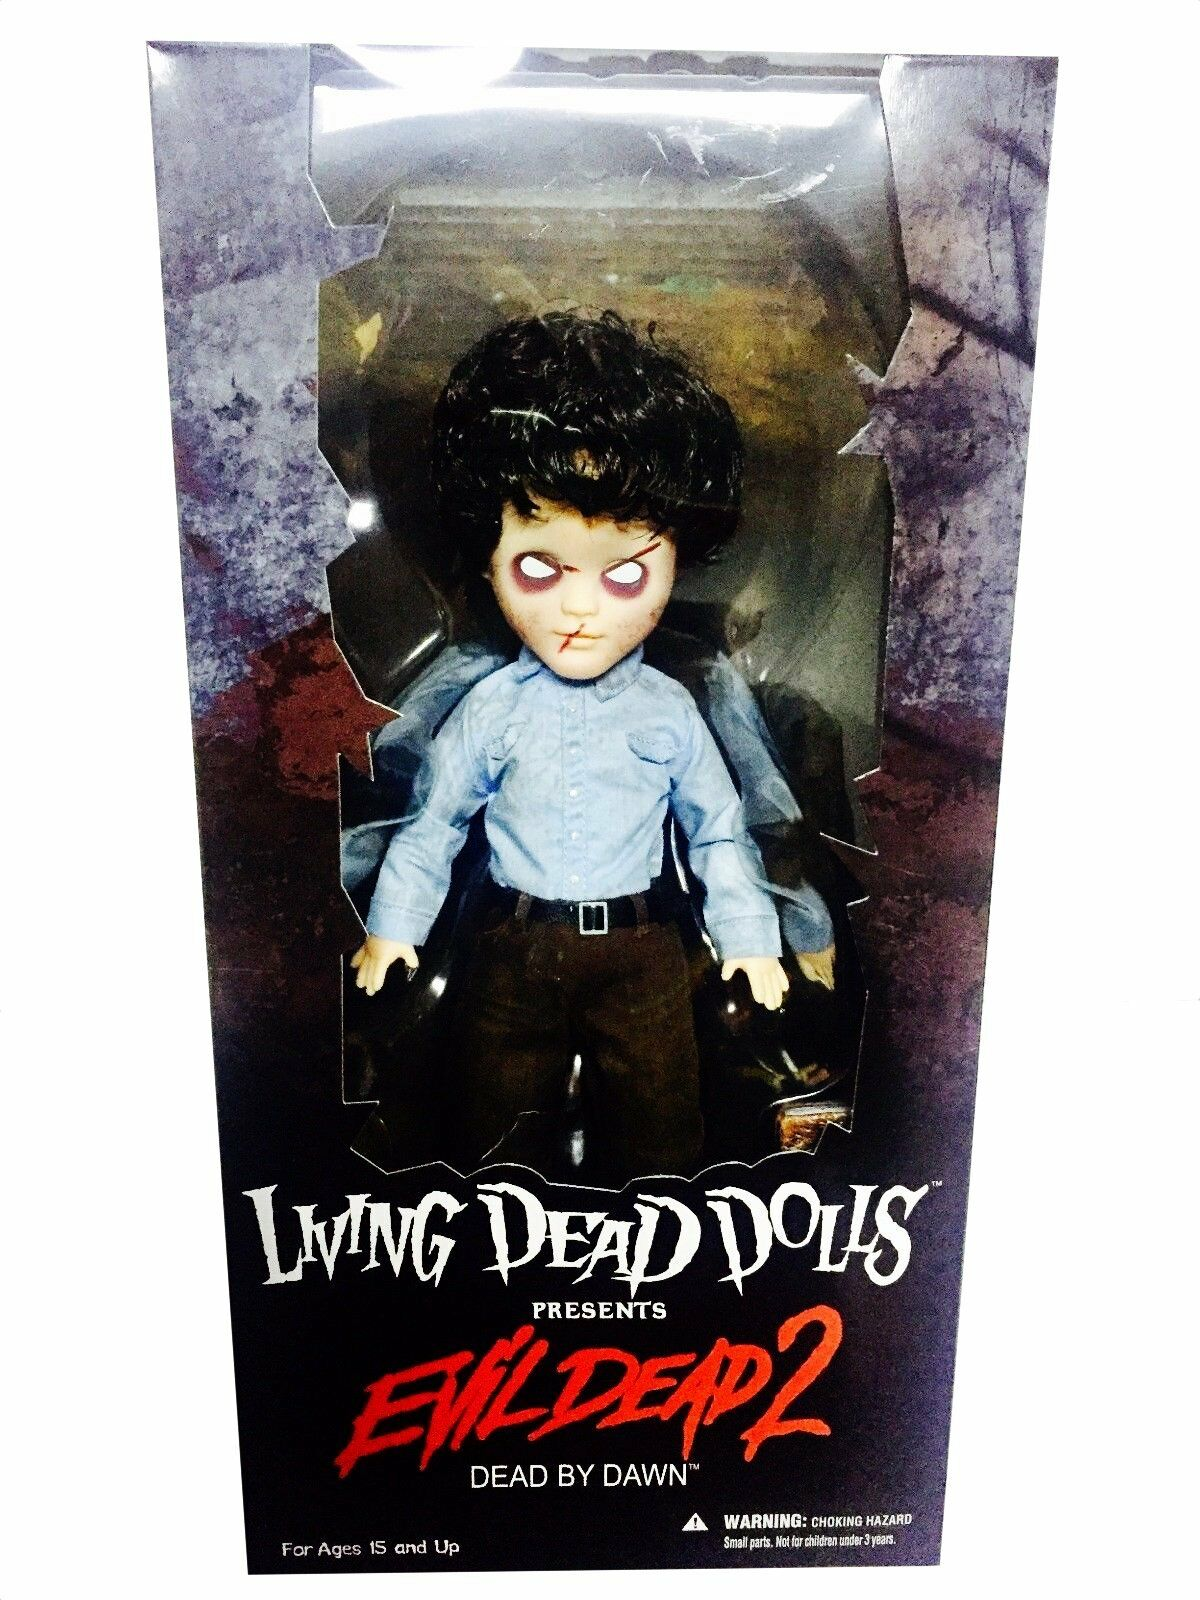 Evil Dead 94712  Living Dead Dolls Presents Ash Zombie Variant  Figure